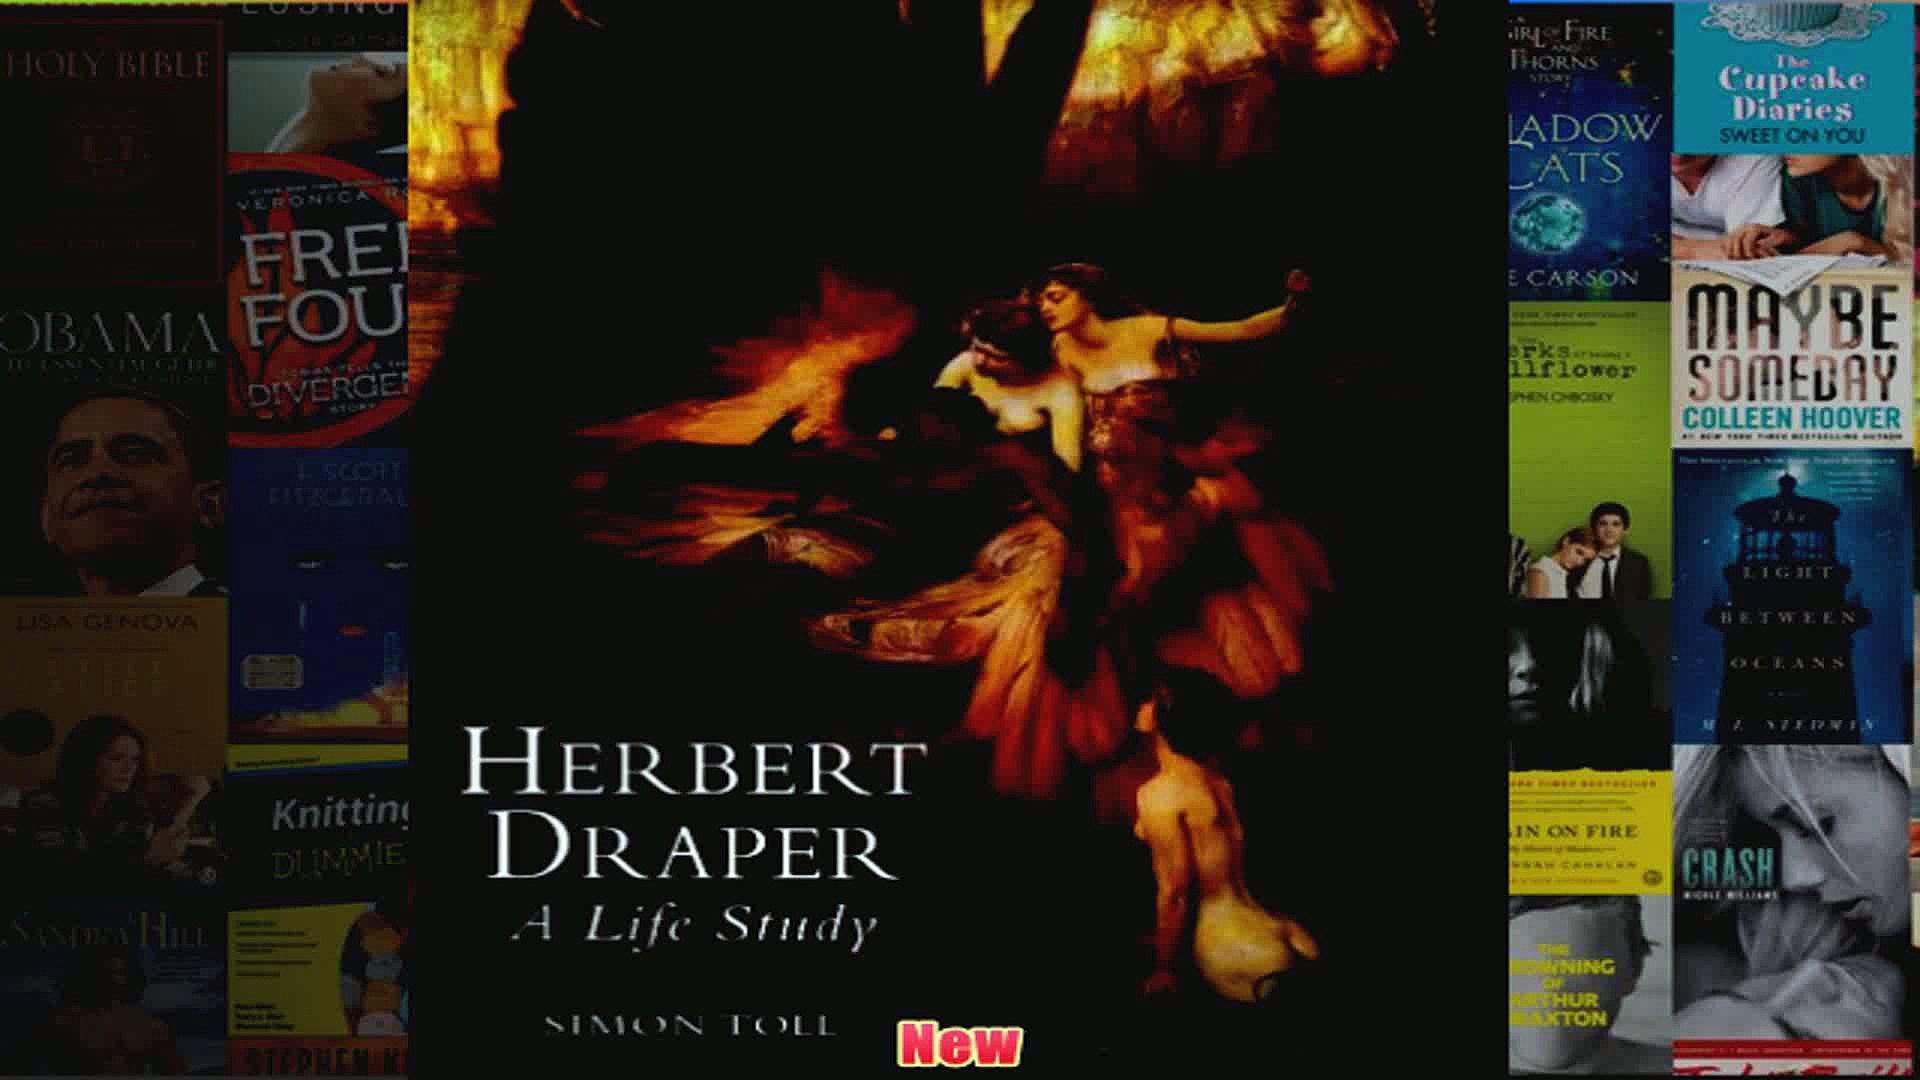 Herbert Draper A Life Study